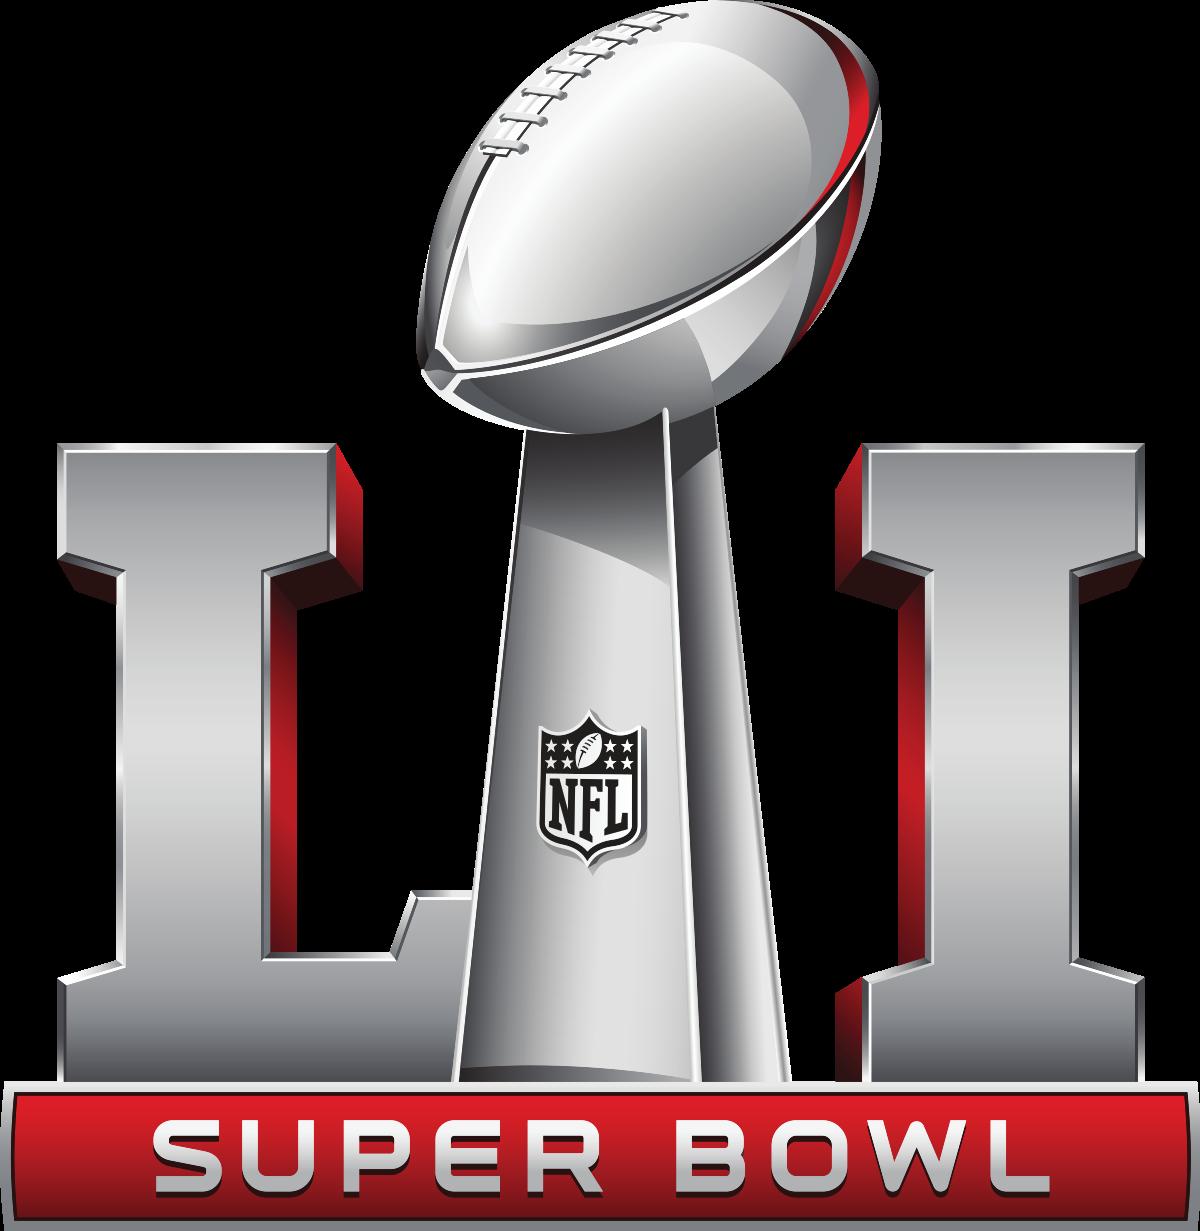 2019 Super Bowl Live Sports Streaming Free Nfl Live Stream Free Nfl Super Bow Super Bowl 51 Super Bowl Winners Super Bowl Tickets